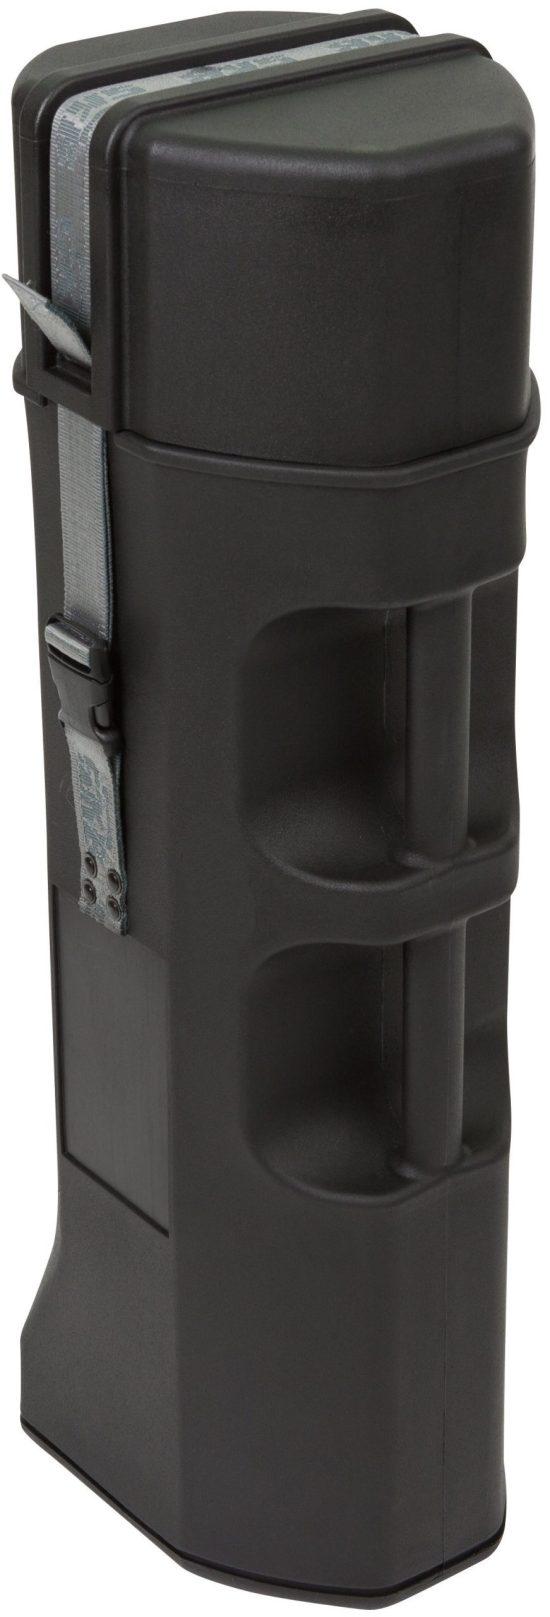 Case Club CCR29071SK Case - Foam Example